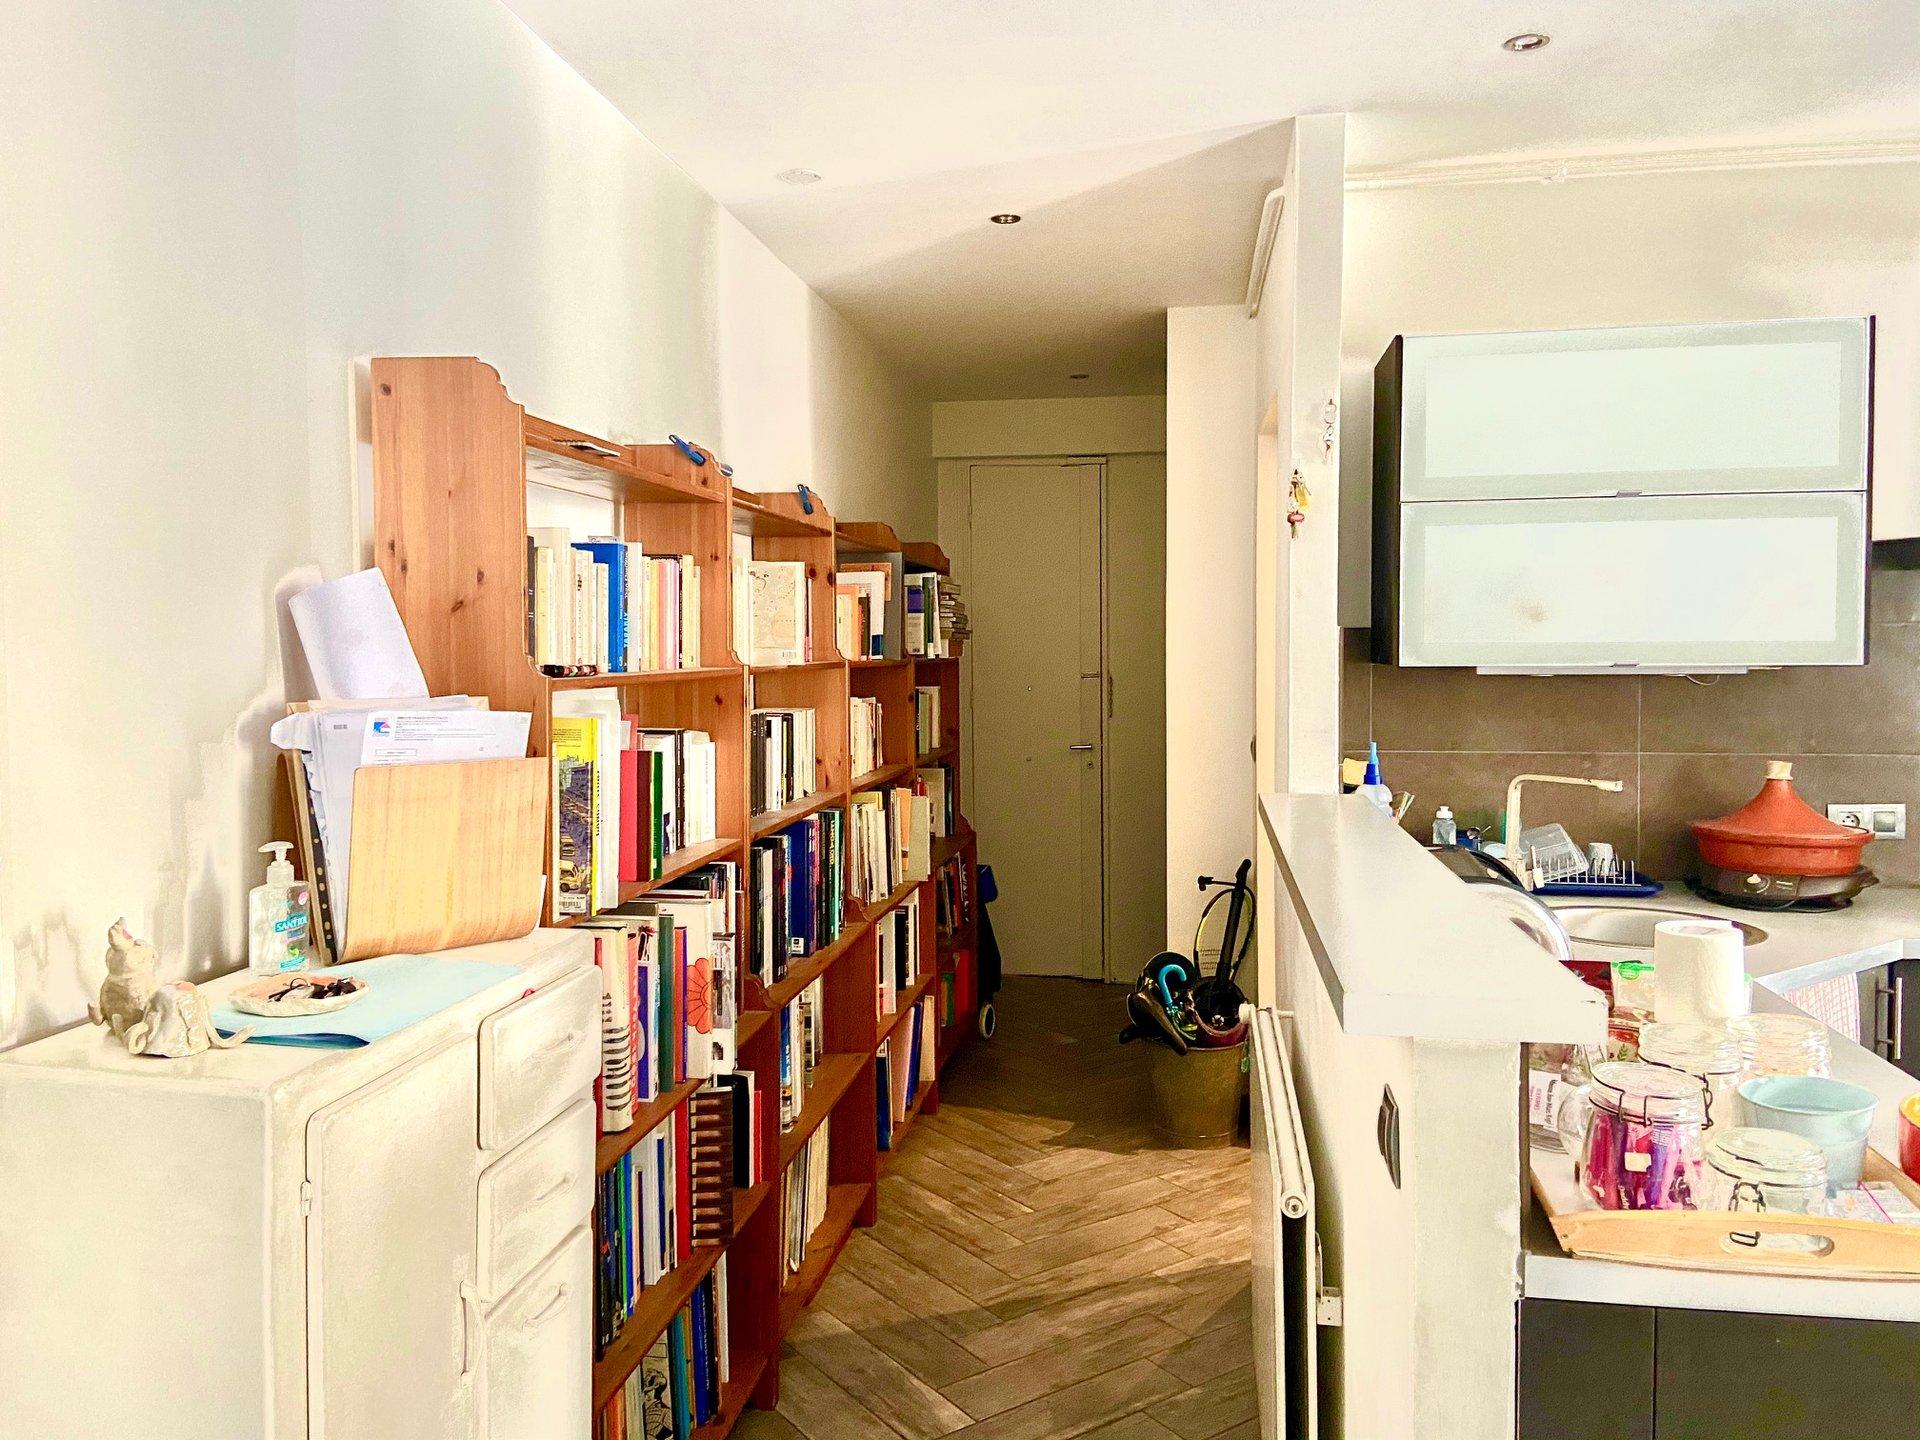 3 BEDROOMS APARTMENT - CESSOLE & LIBERATION